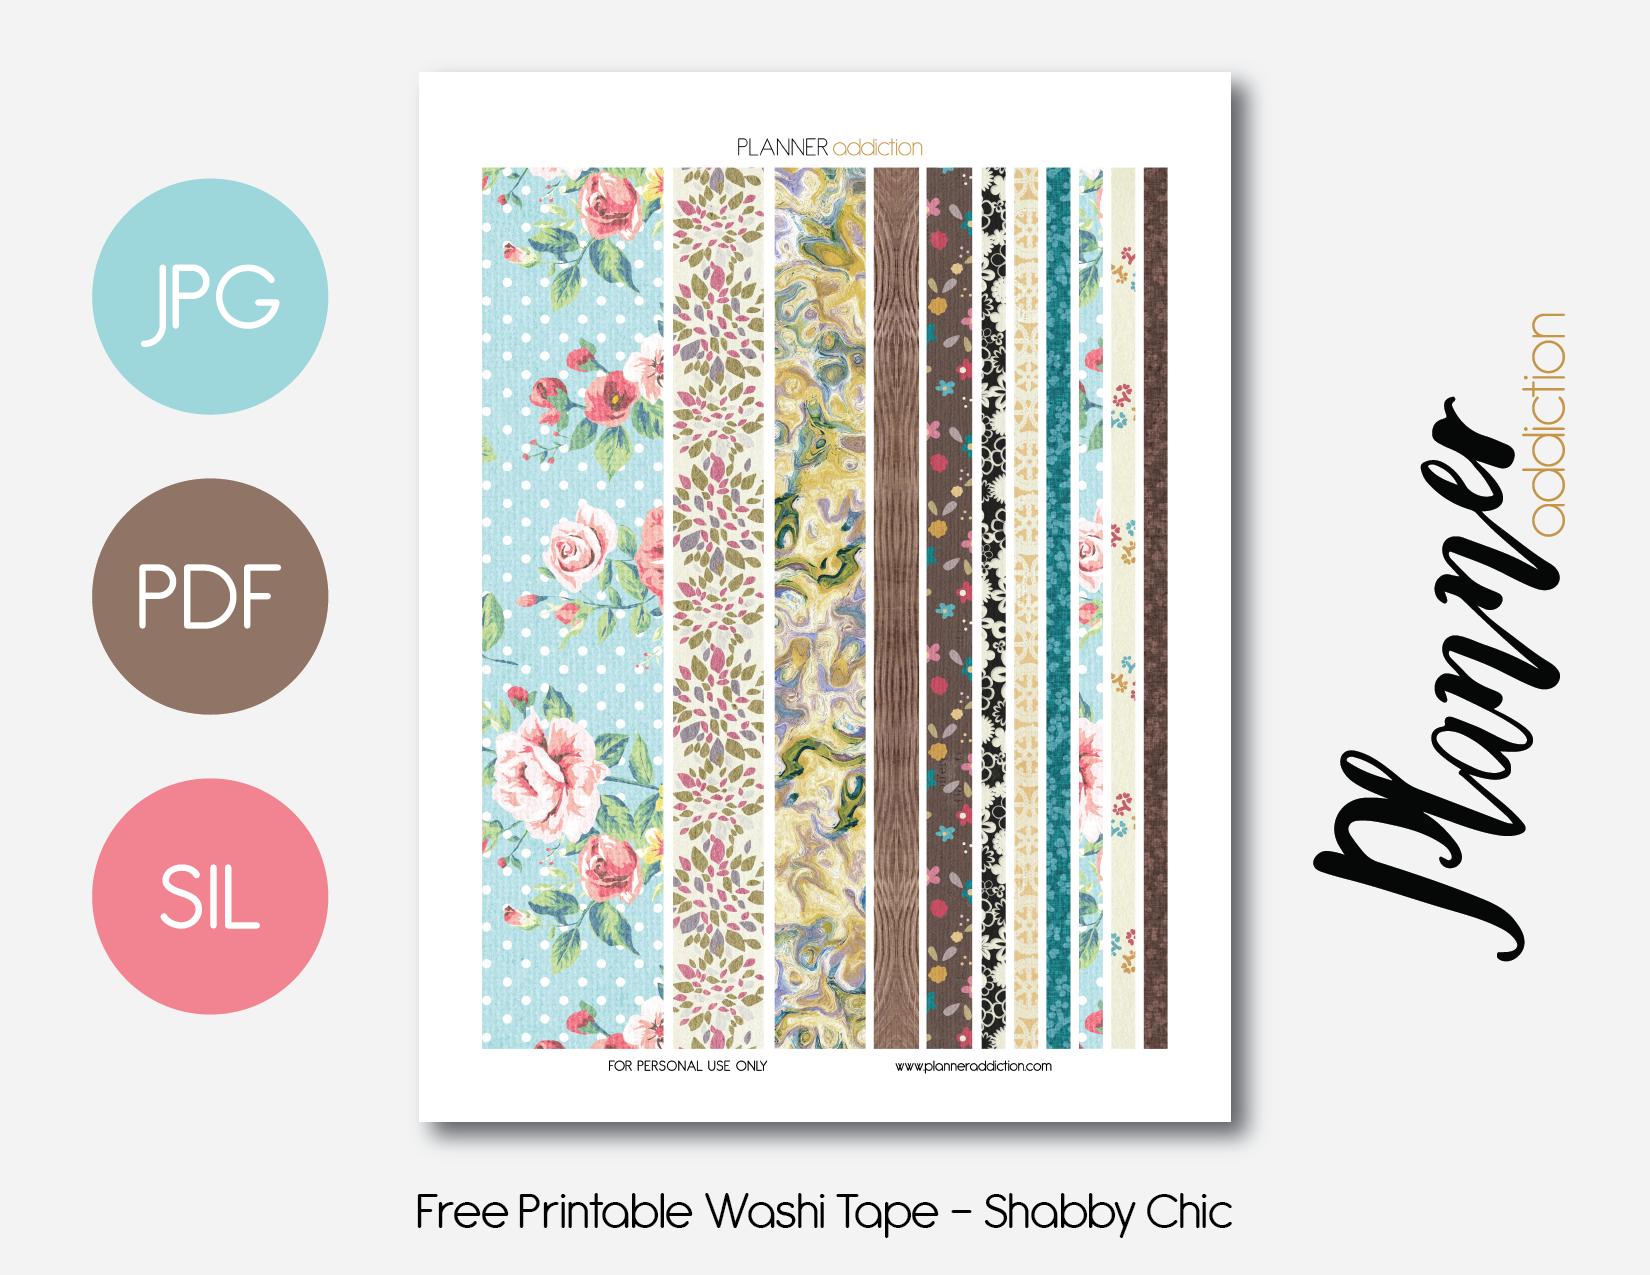 Free Printable Washi Tape – Planner Addiction - Free Printable Washi Tape